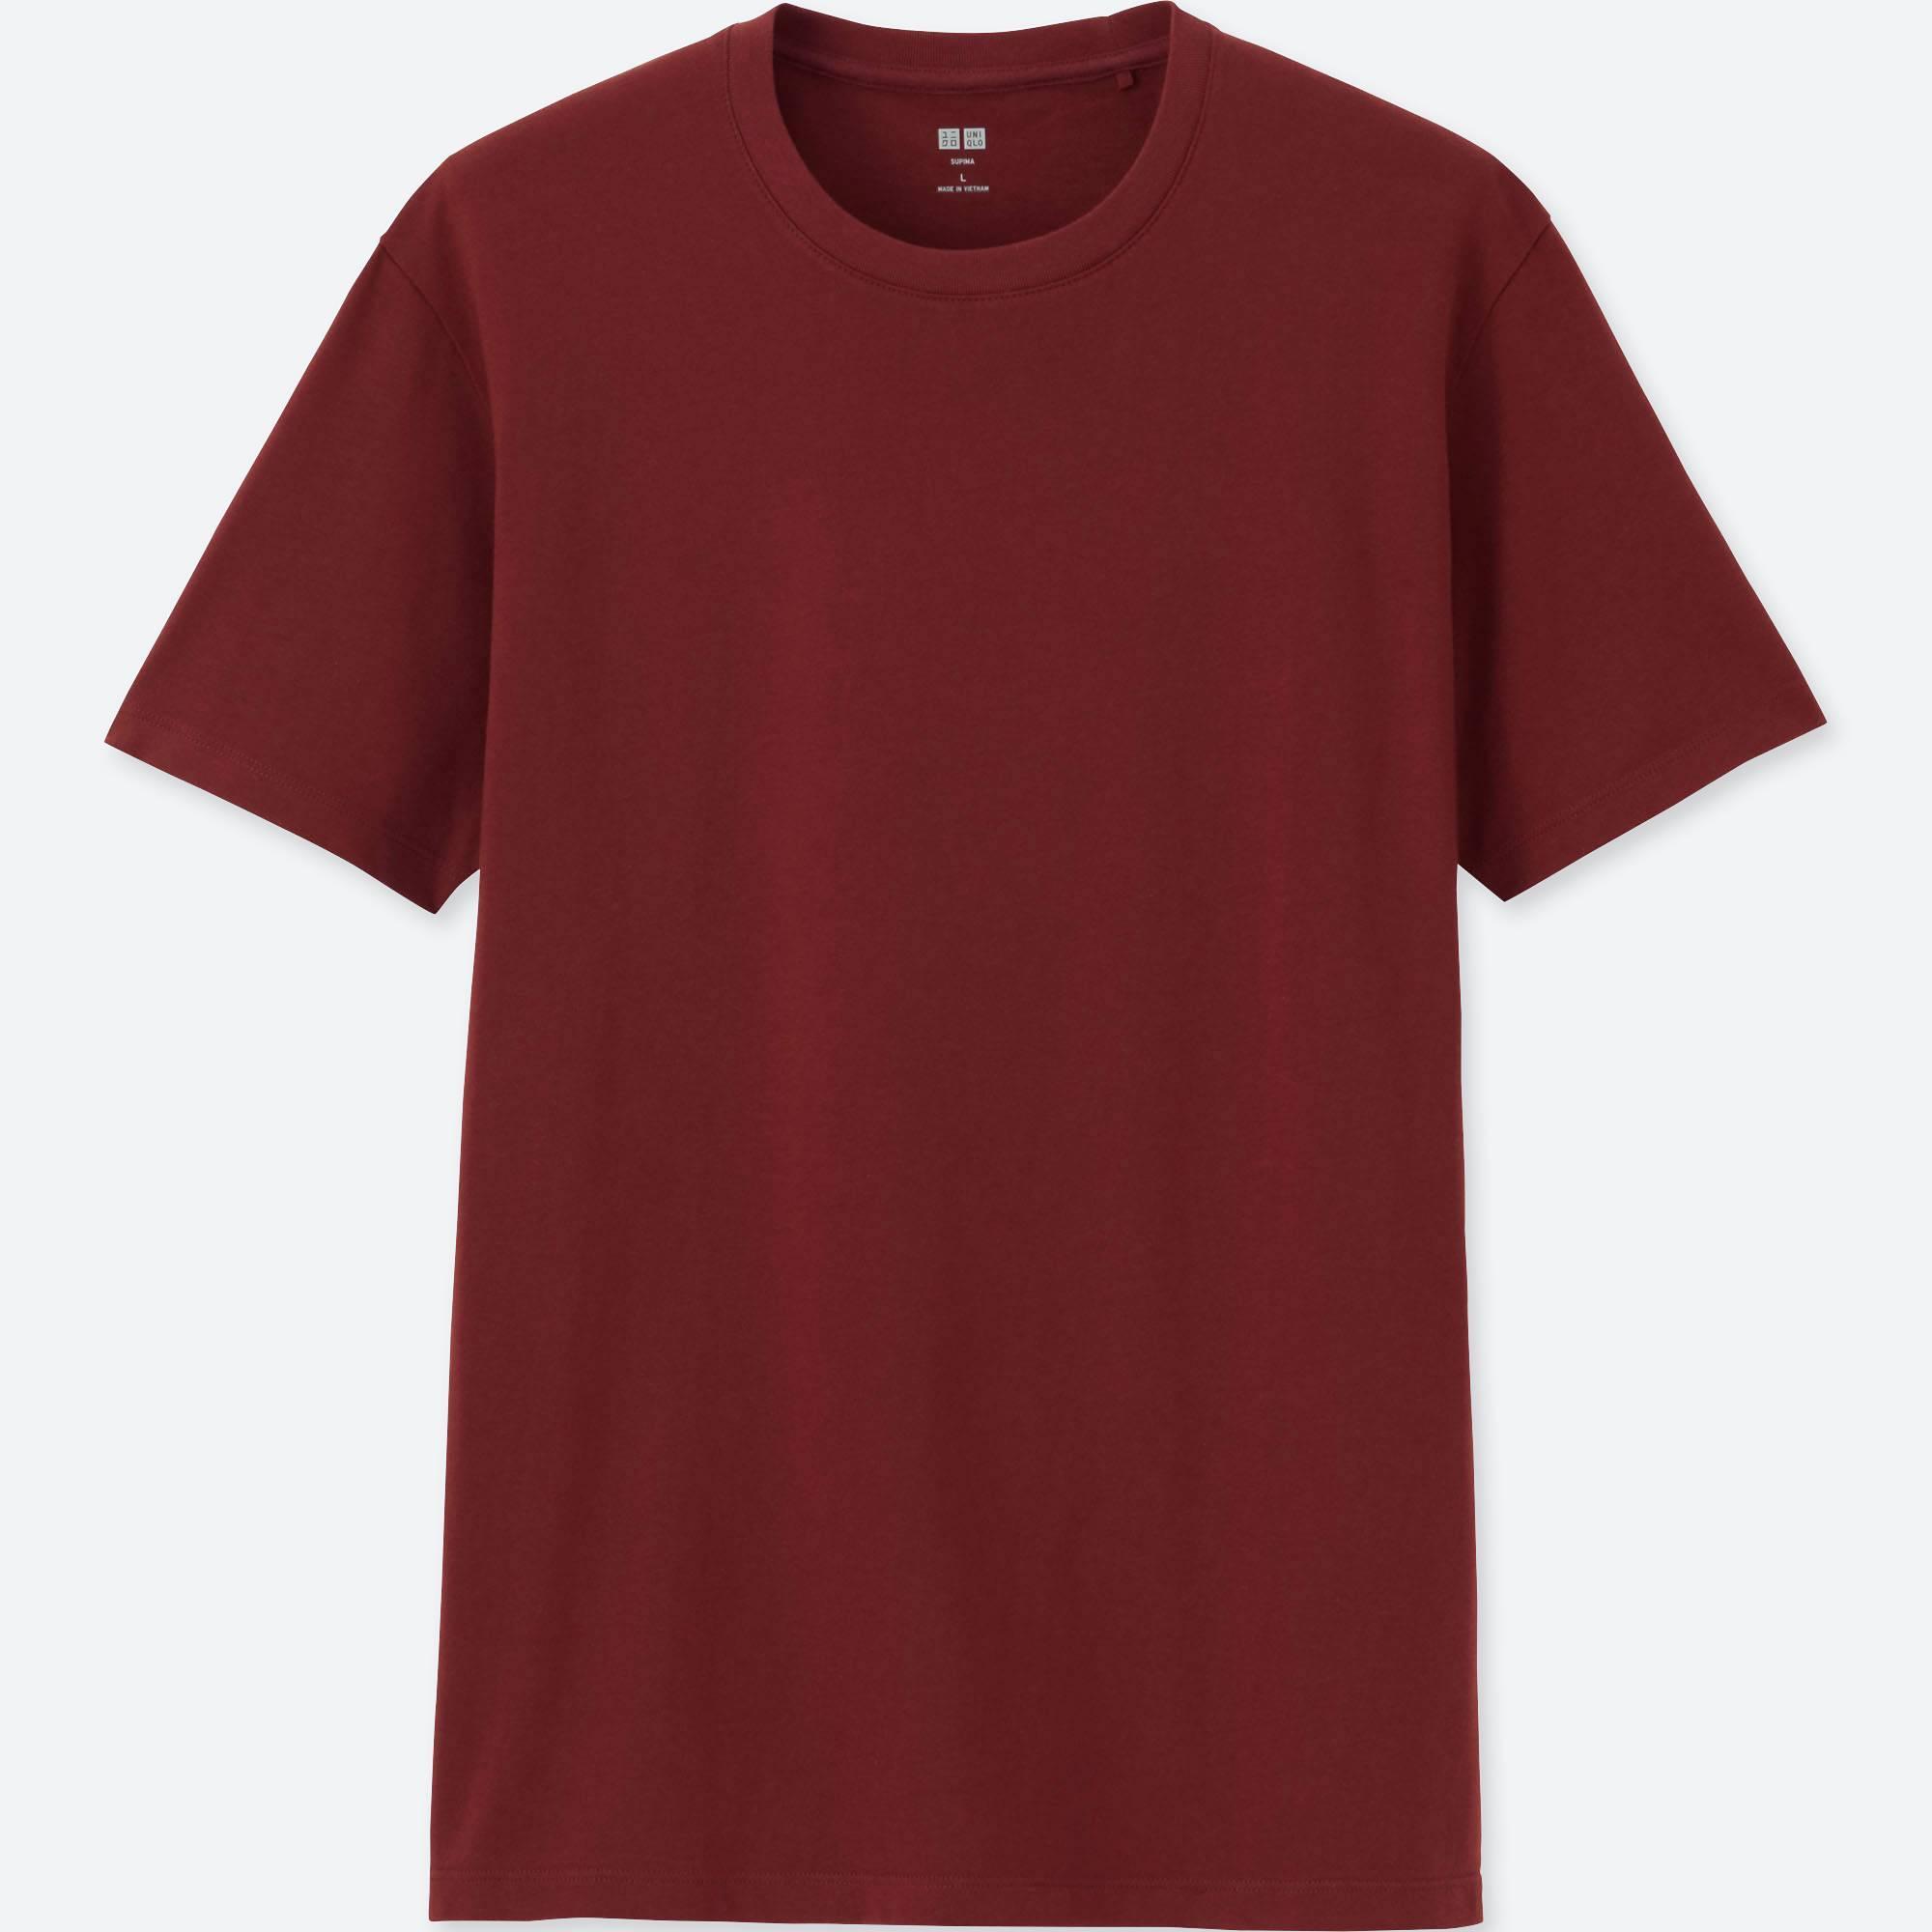 Uniqlo Men Supima Cotton Crew Neck Short Sleeve T Shirt